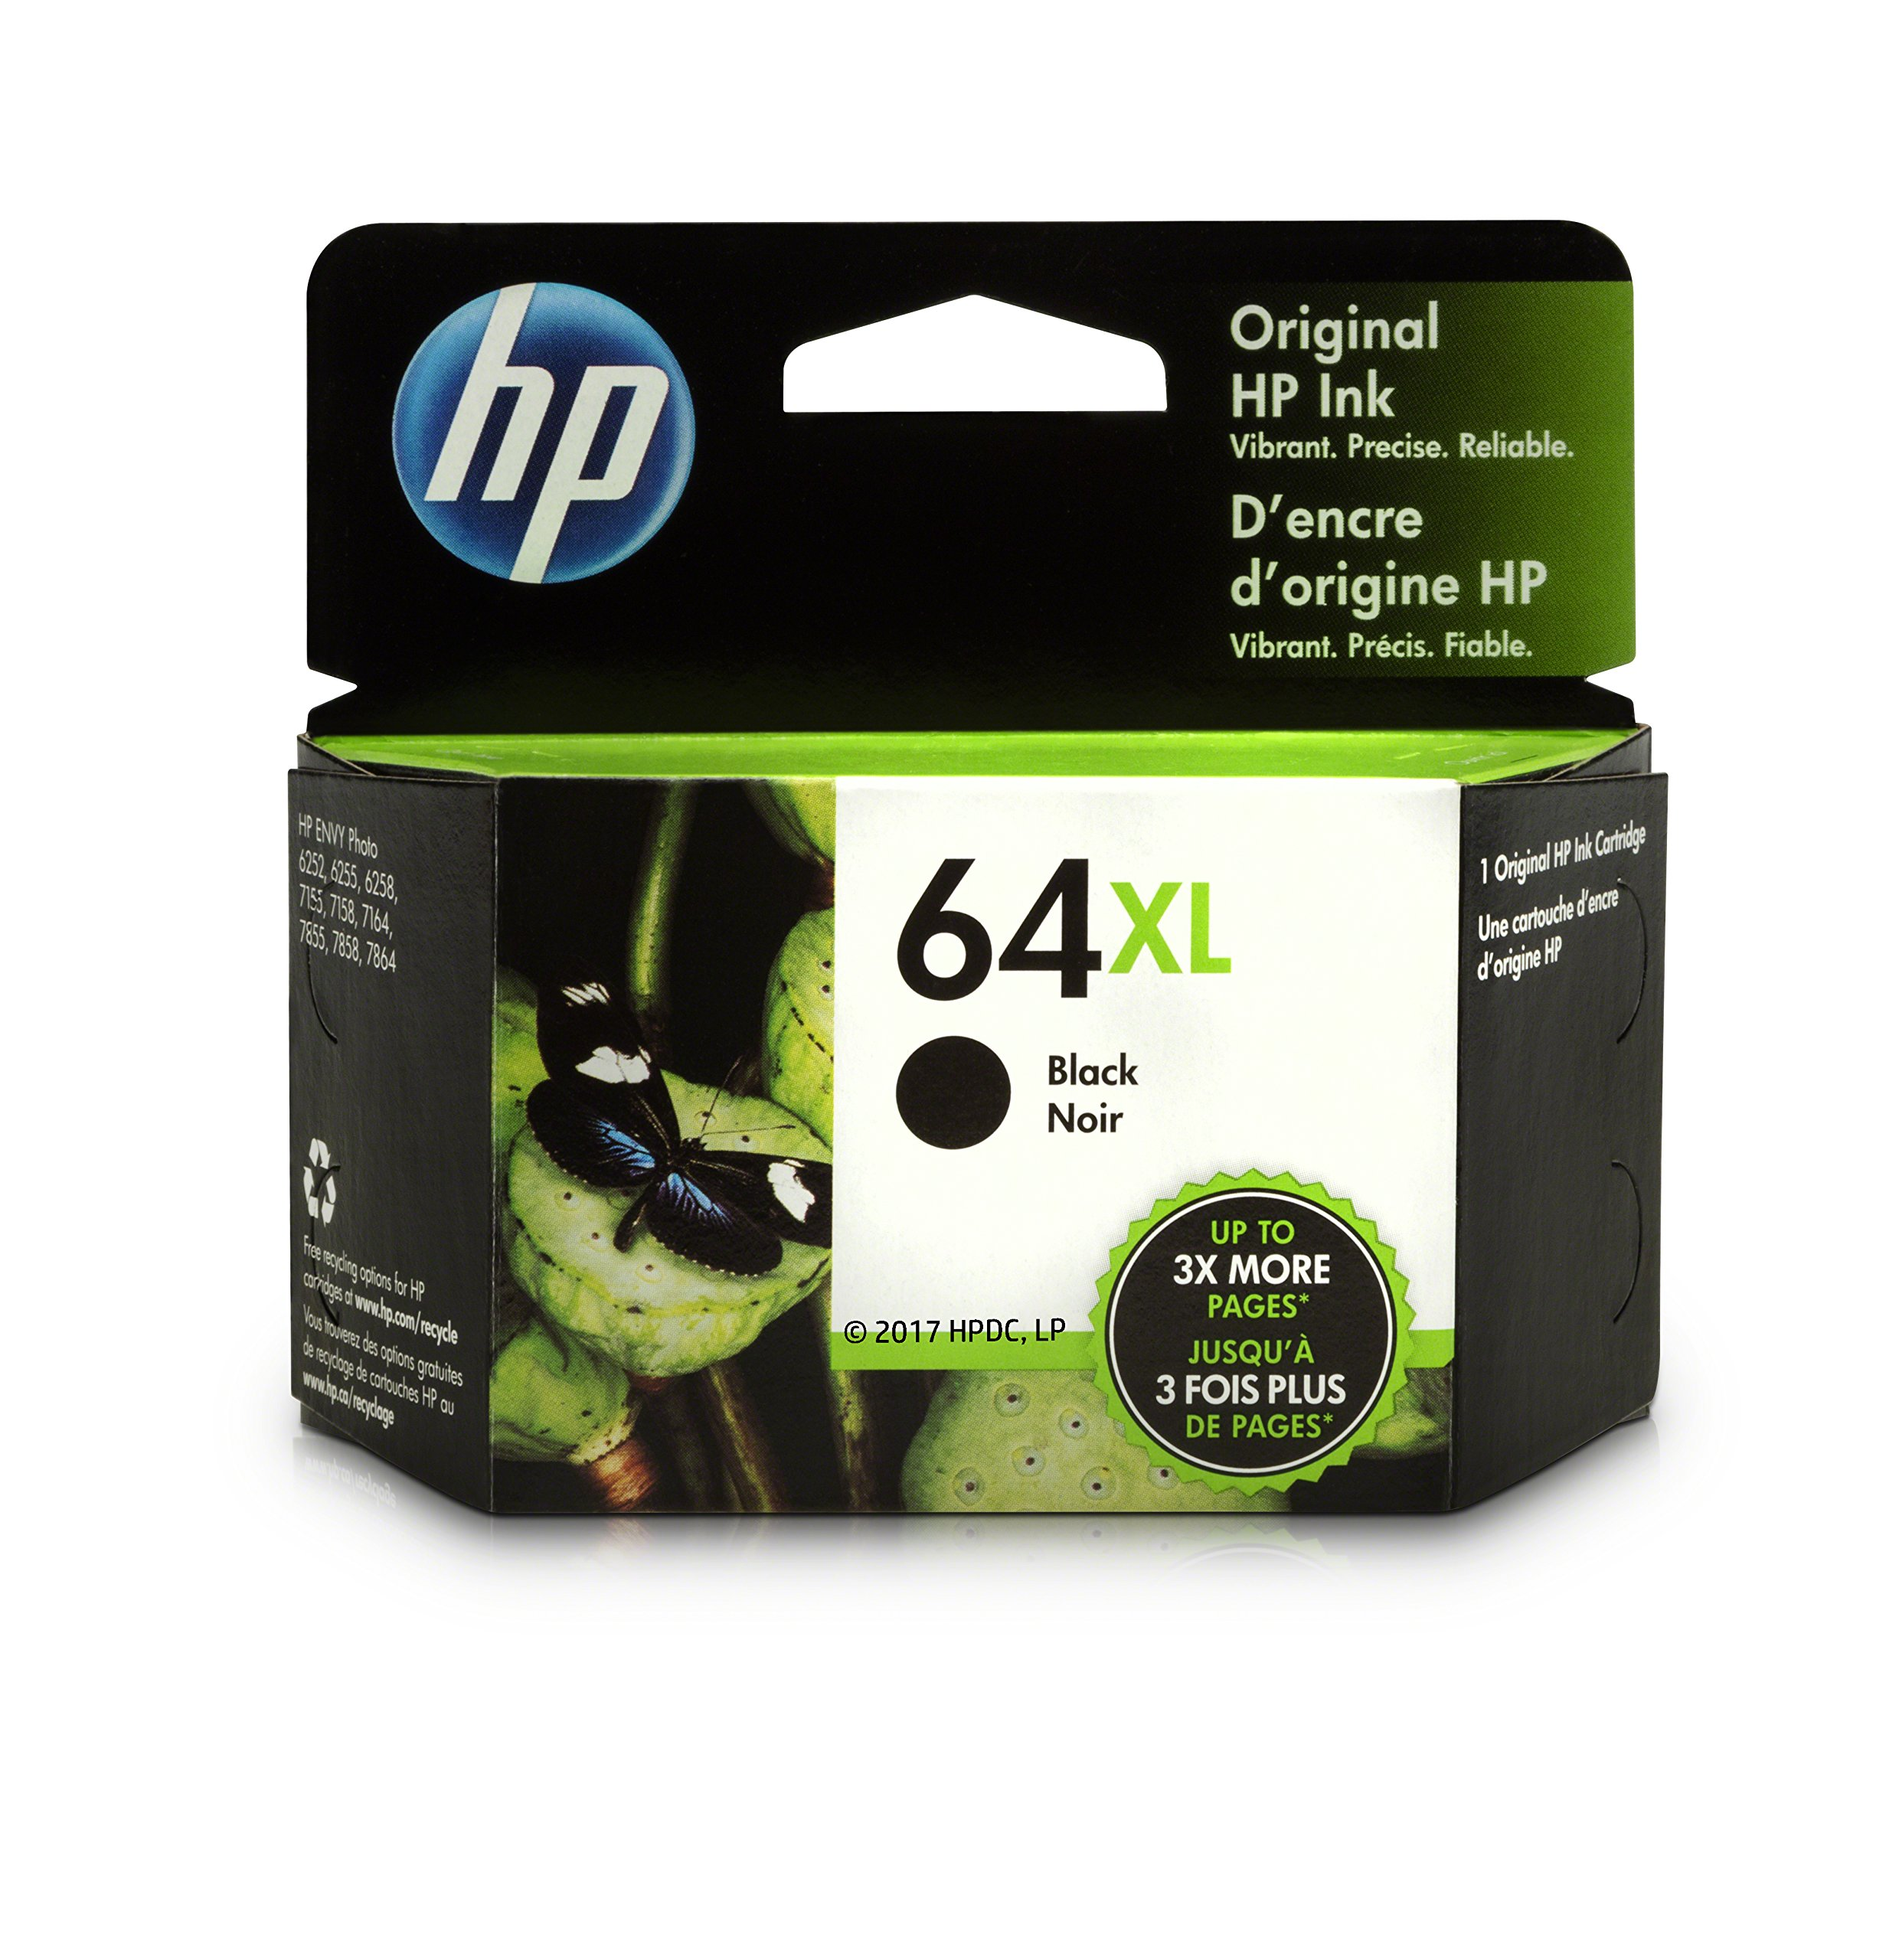 HP 64XL Black High Yield Original Ink Cartridge (N9J92AN) for HP ENVY Photo 6252 6255 6258 7155 7158 7164 7855 7858 7864 HP ENVY 5542